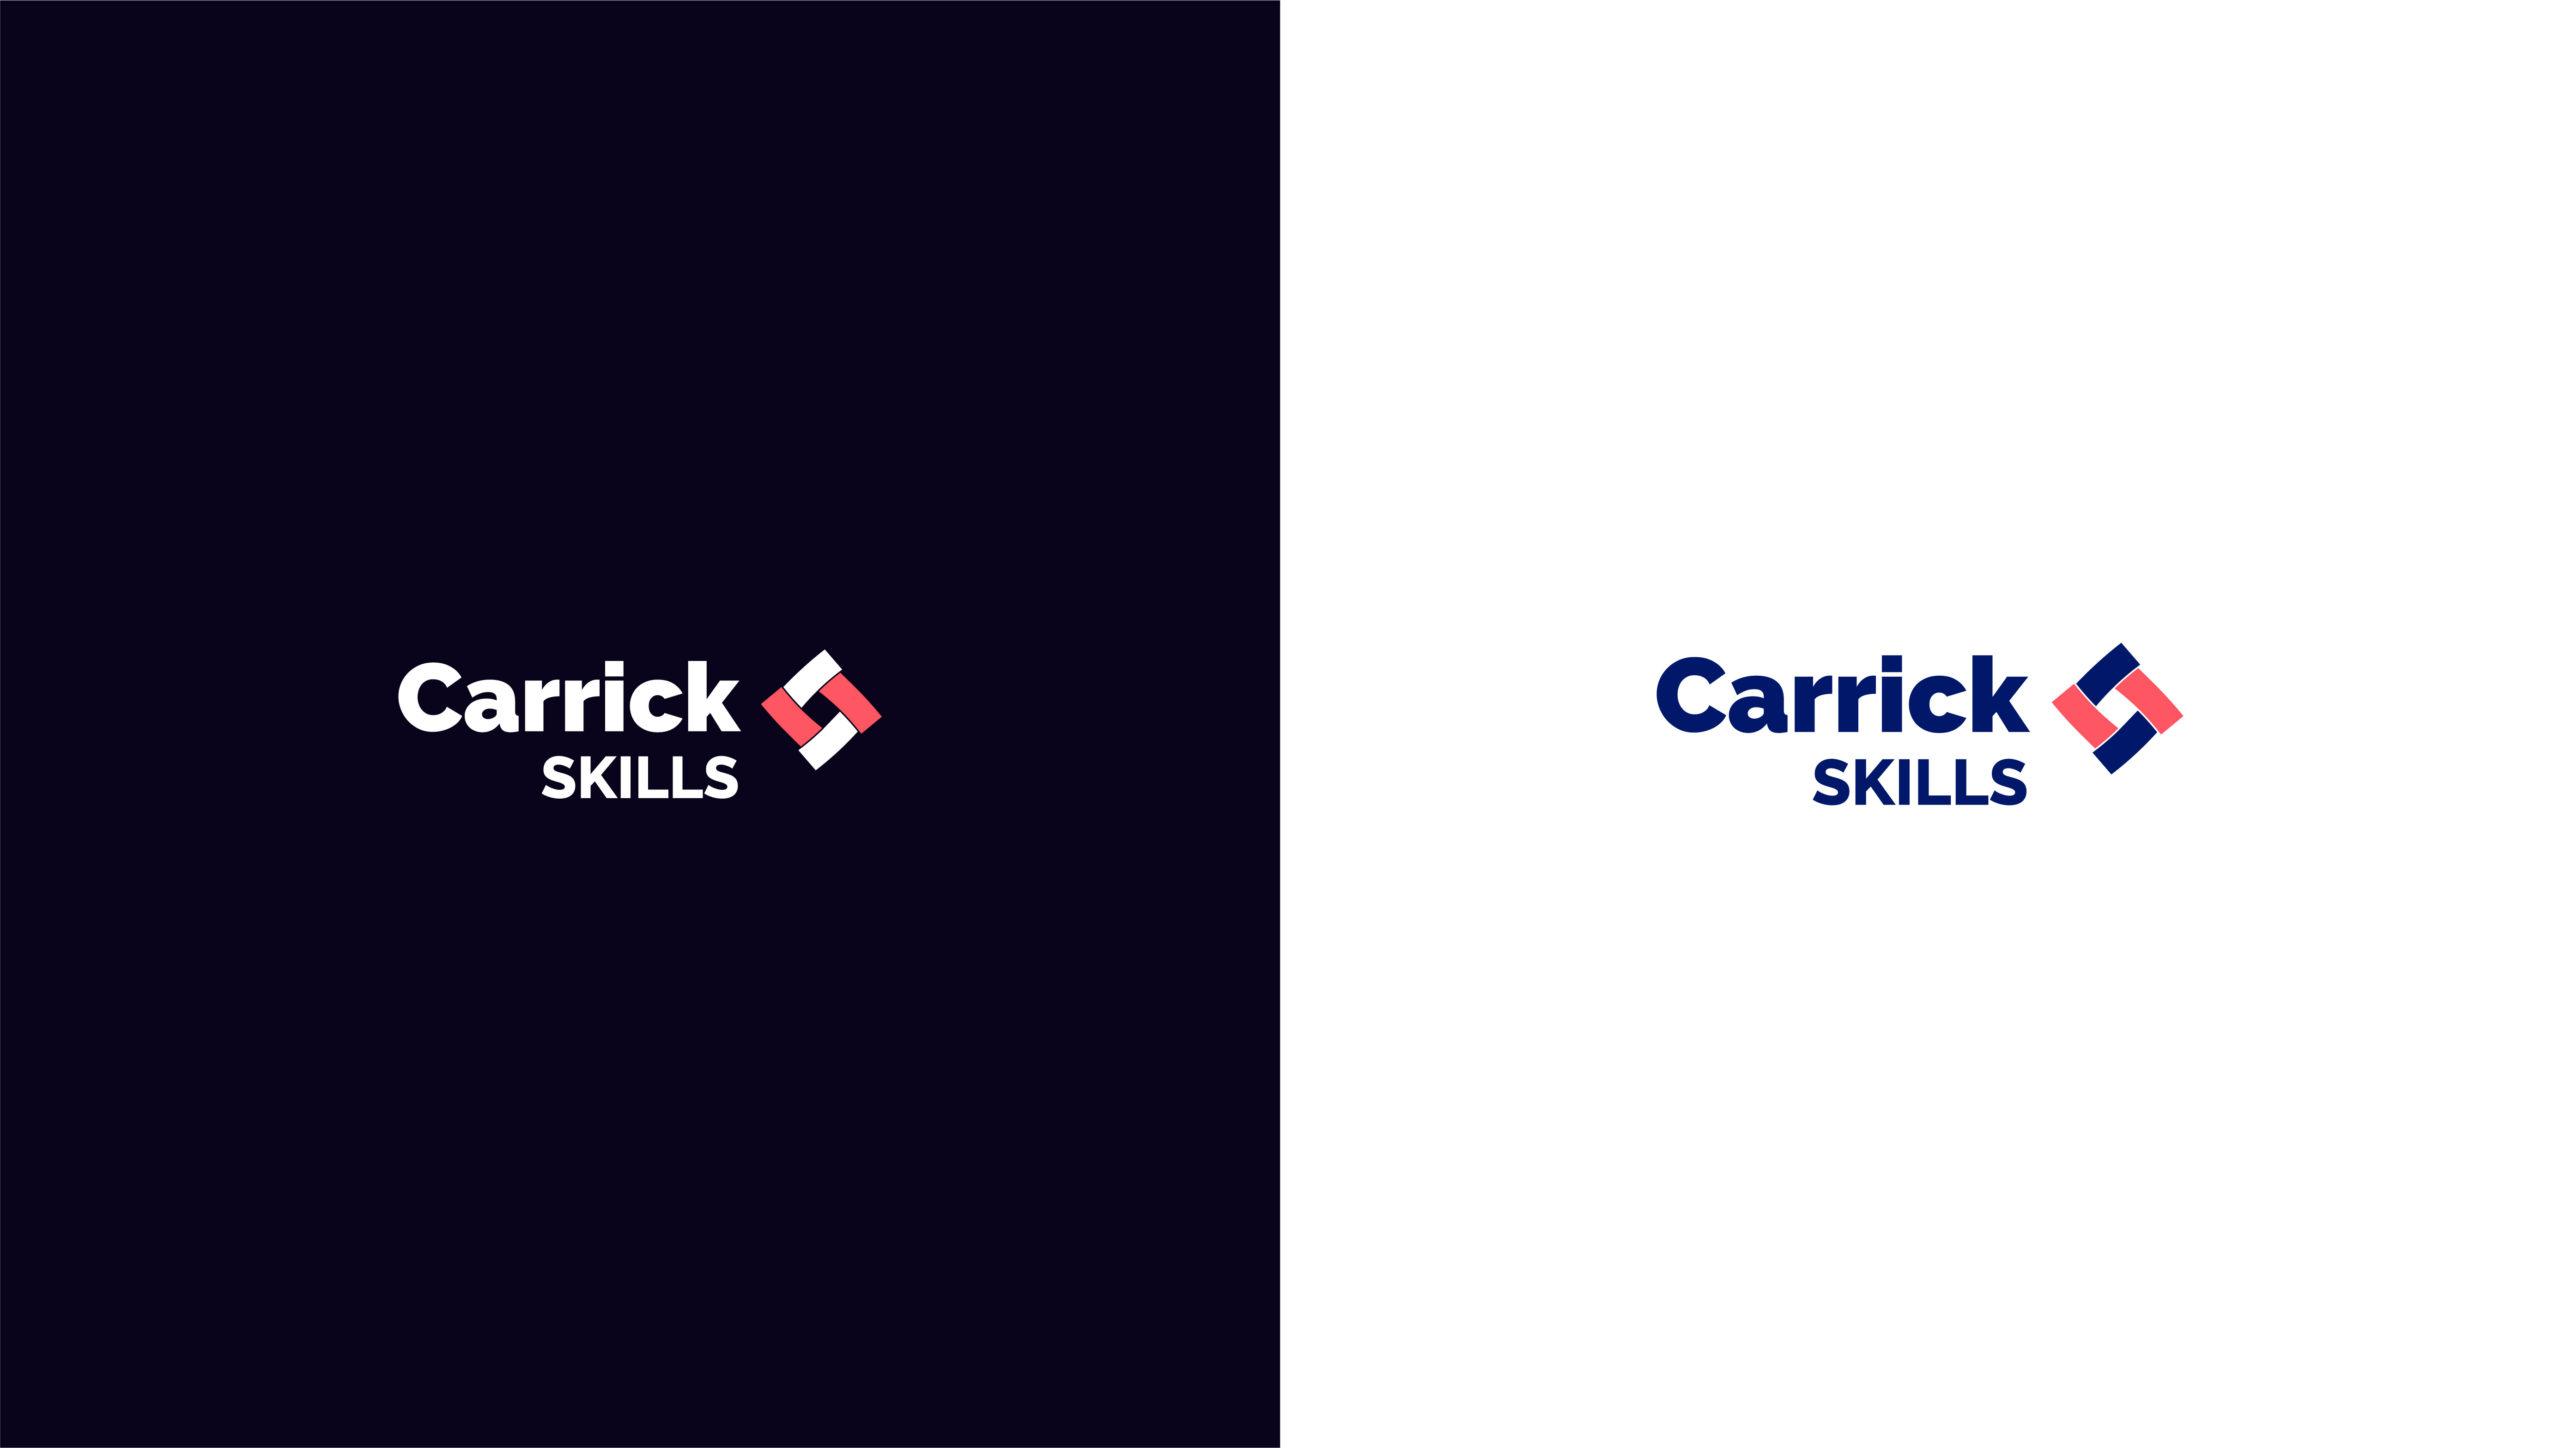 Mise_en_page_Carrick-skills 3